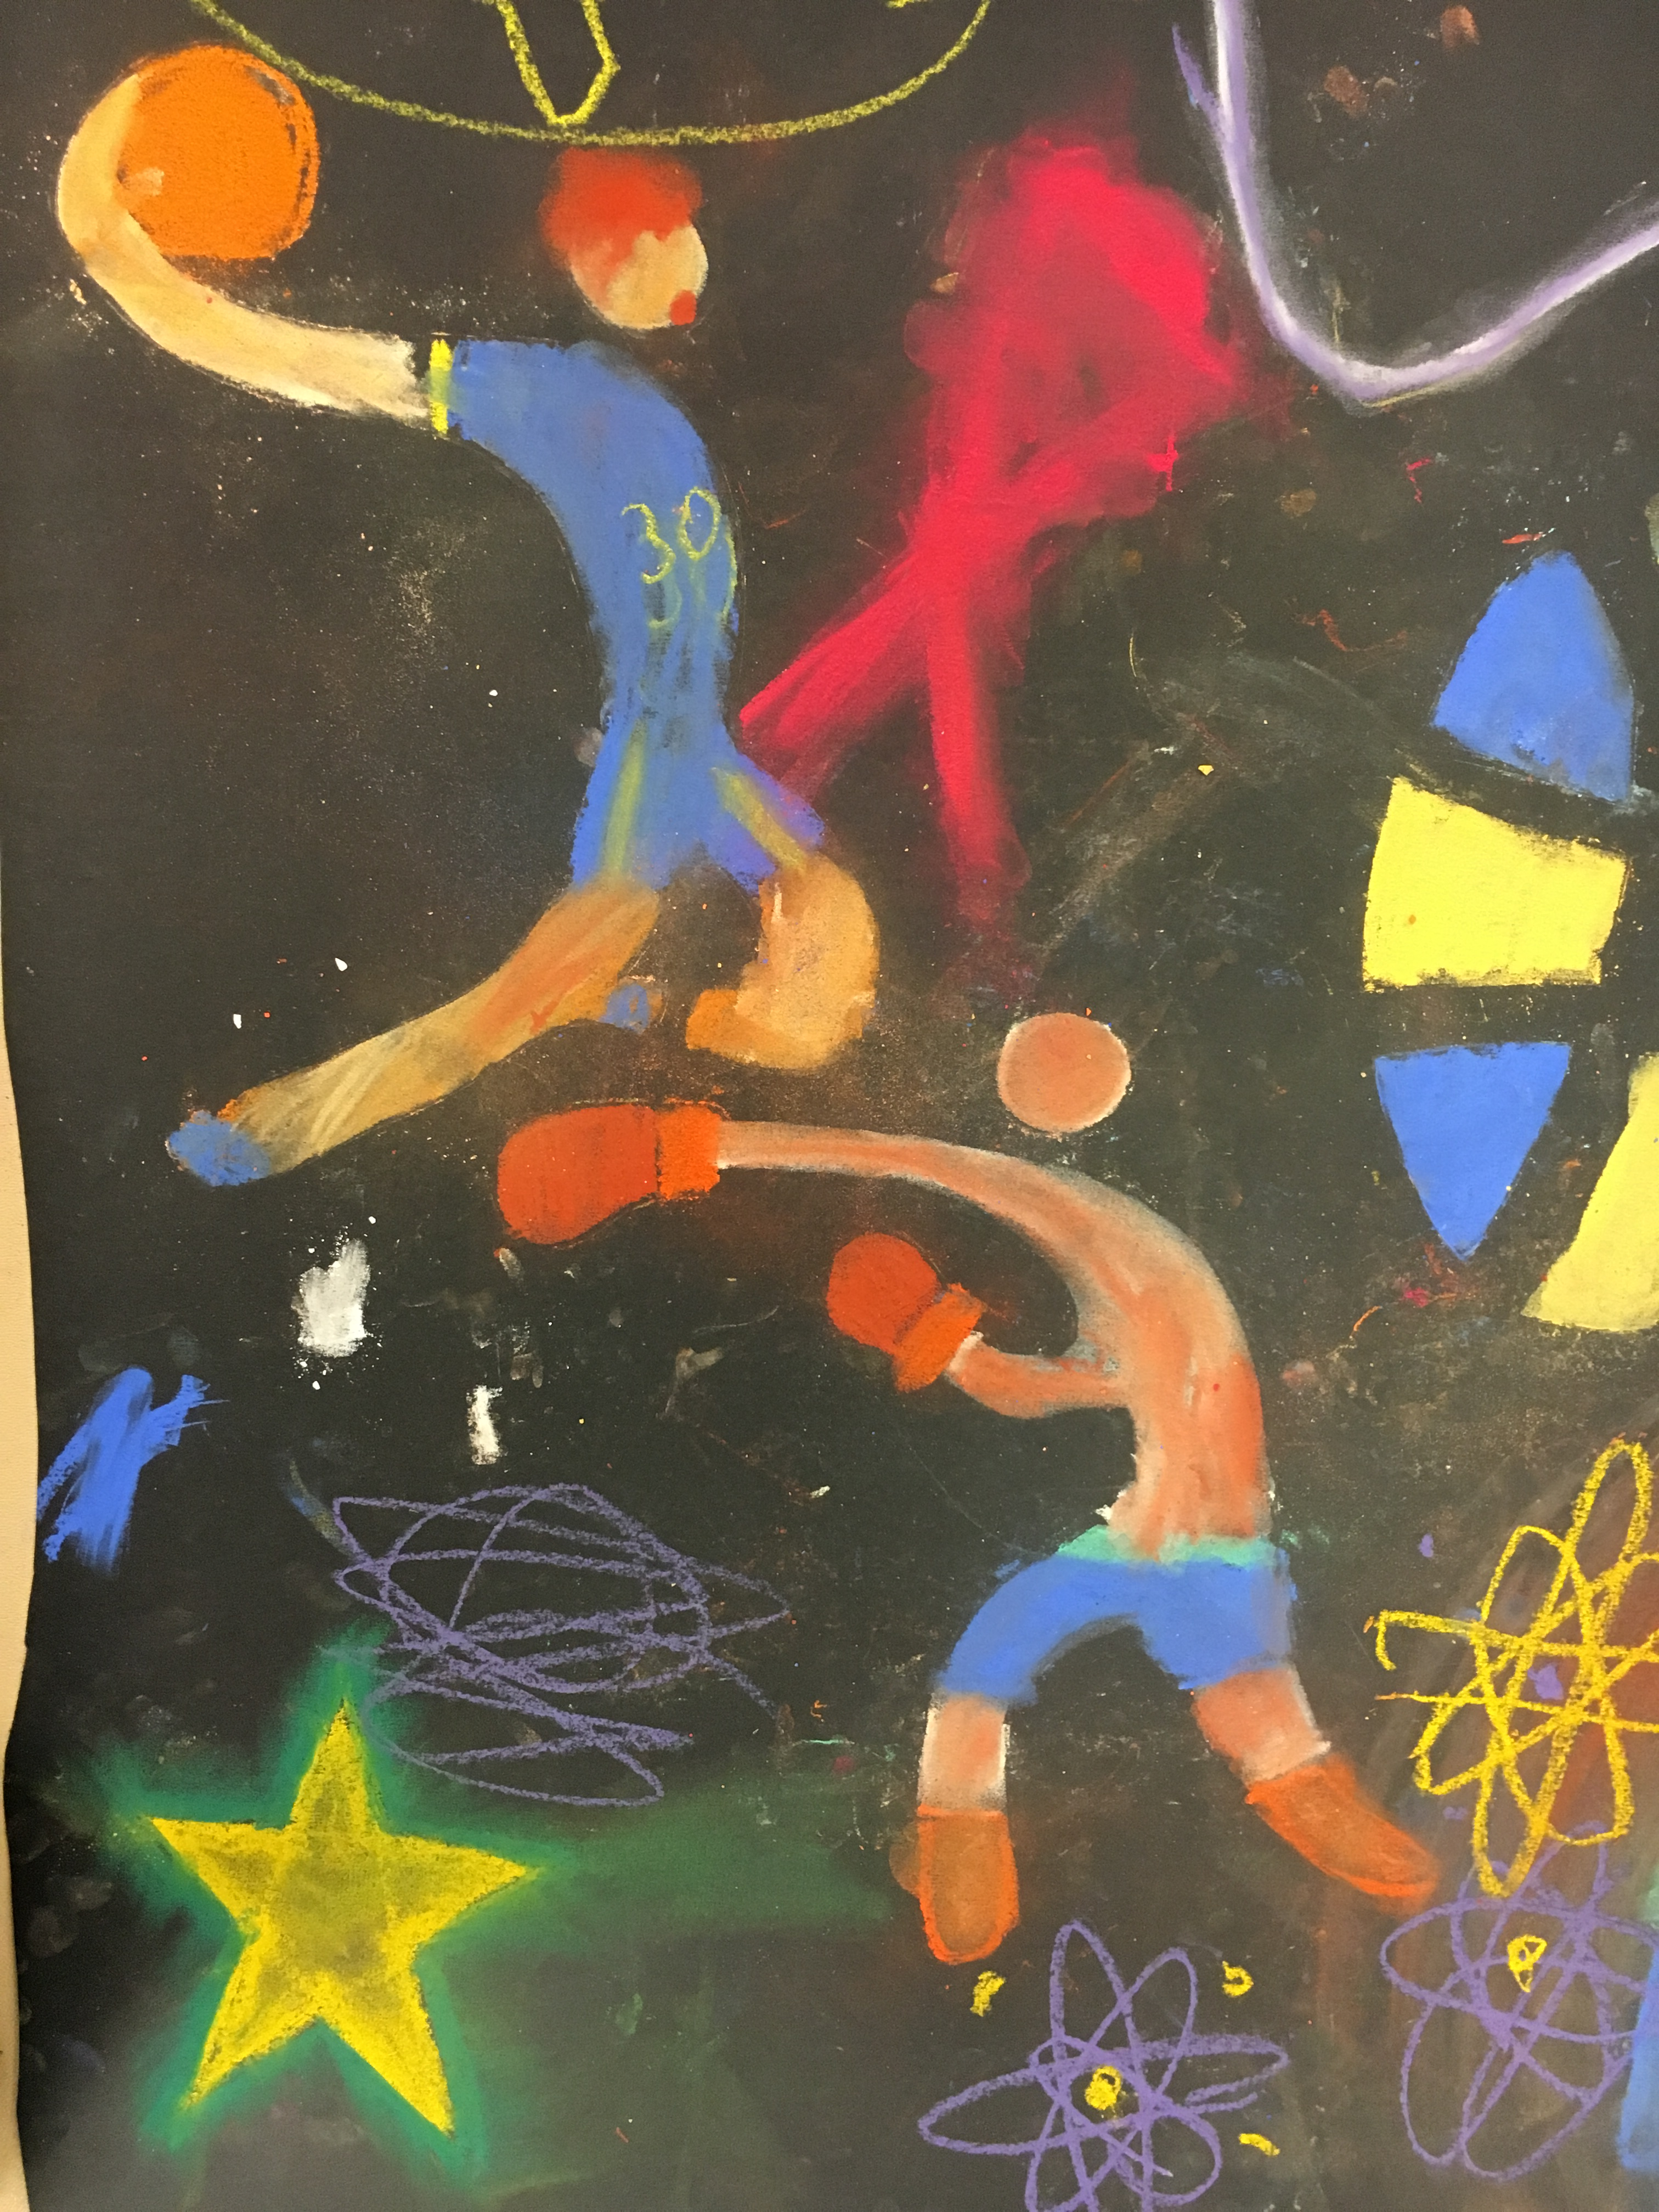 Arturo Ho - Student Artwork